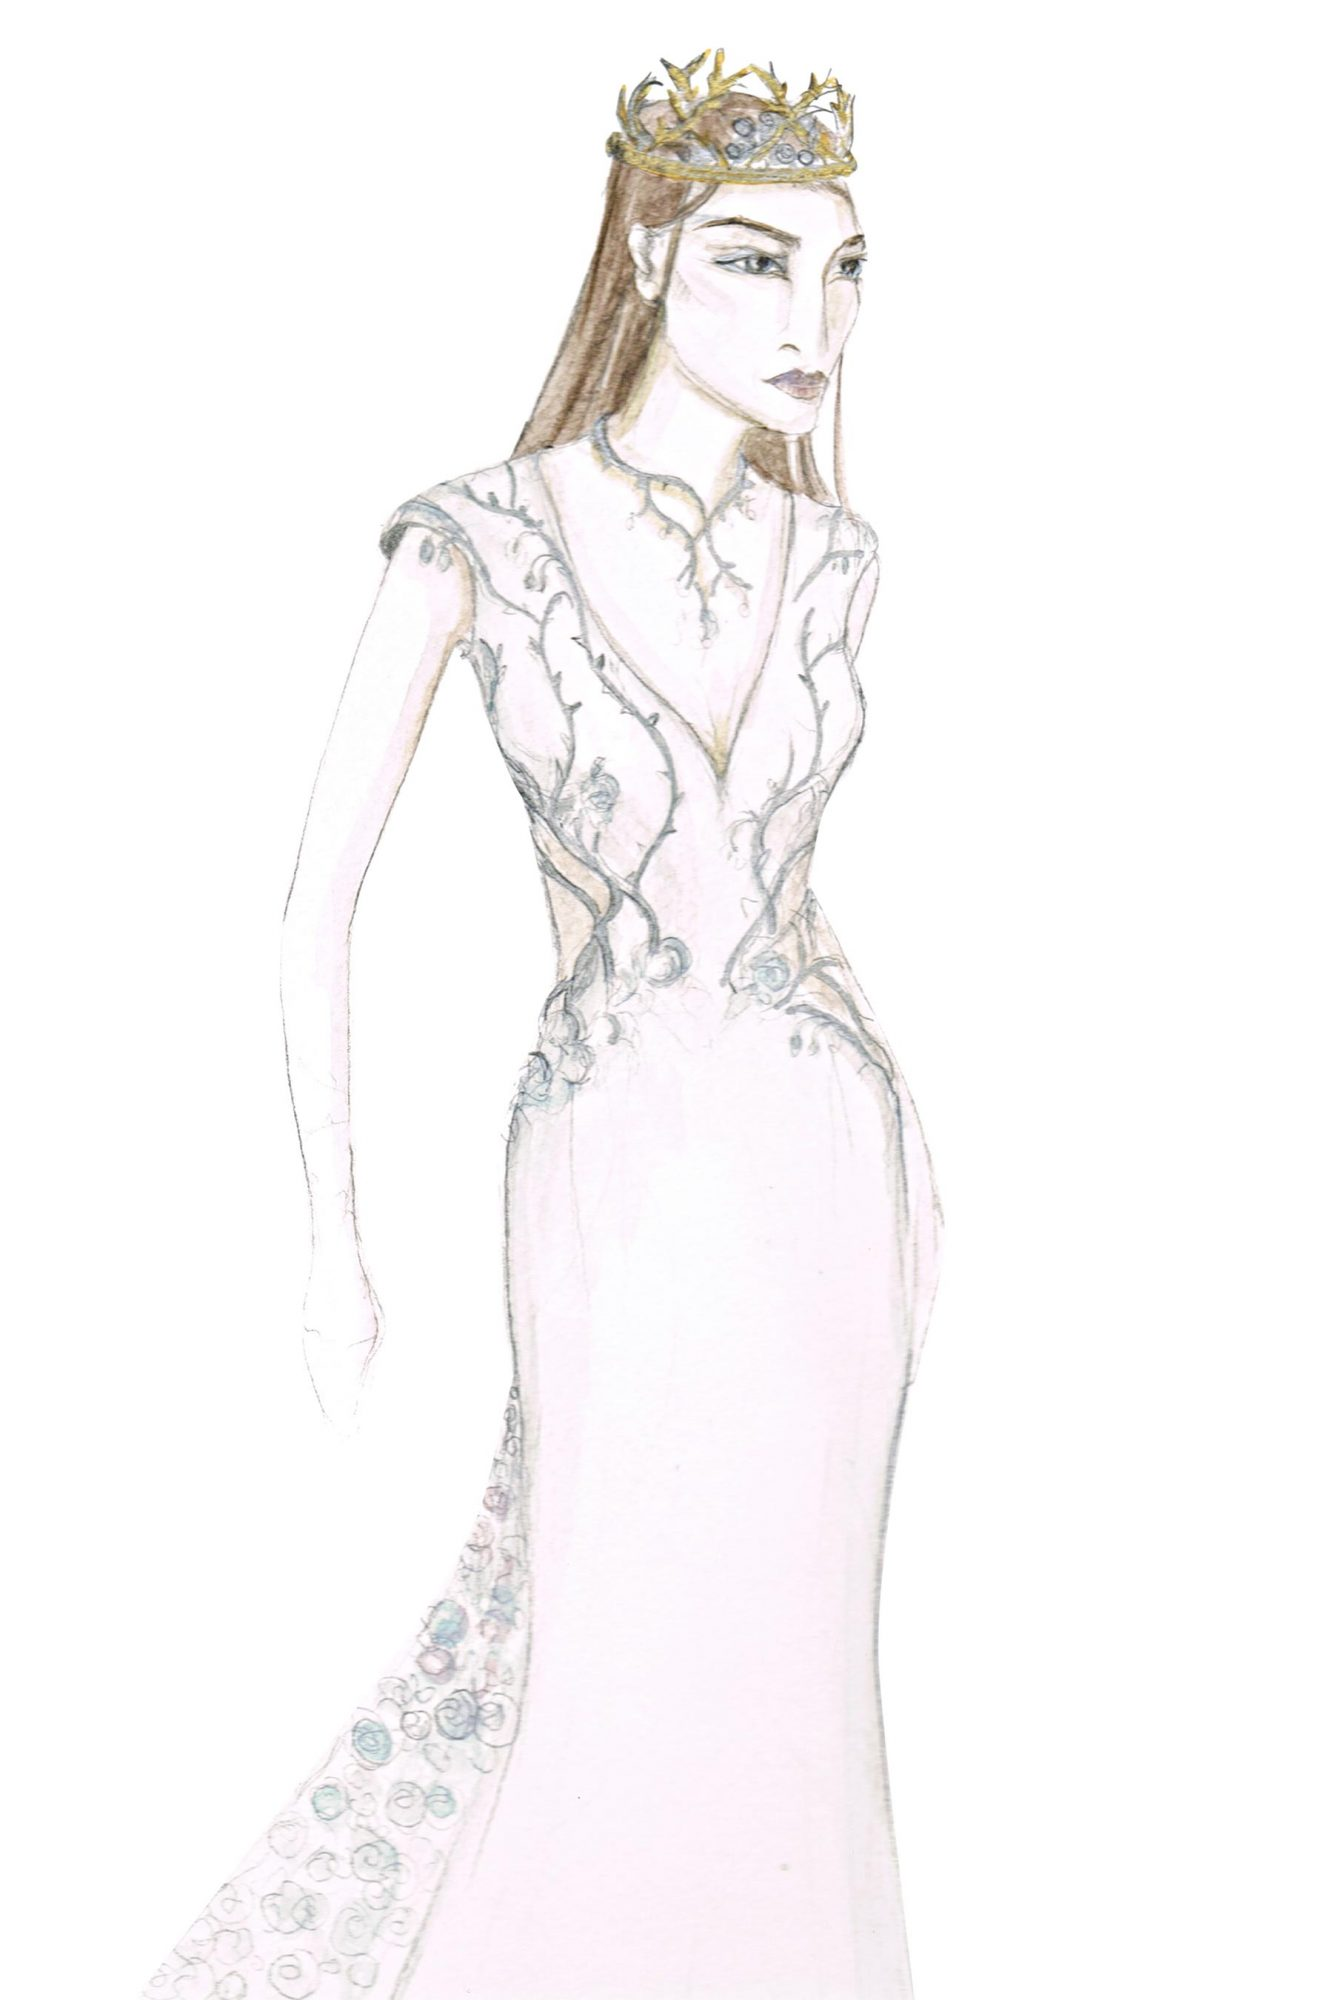 Game of ThronesMargaery TyrellWedding Costume Sketch